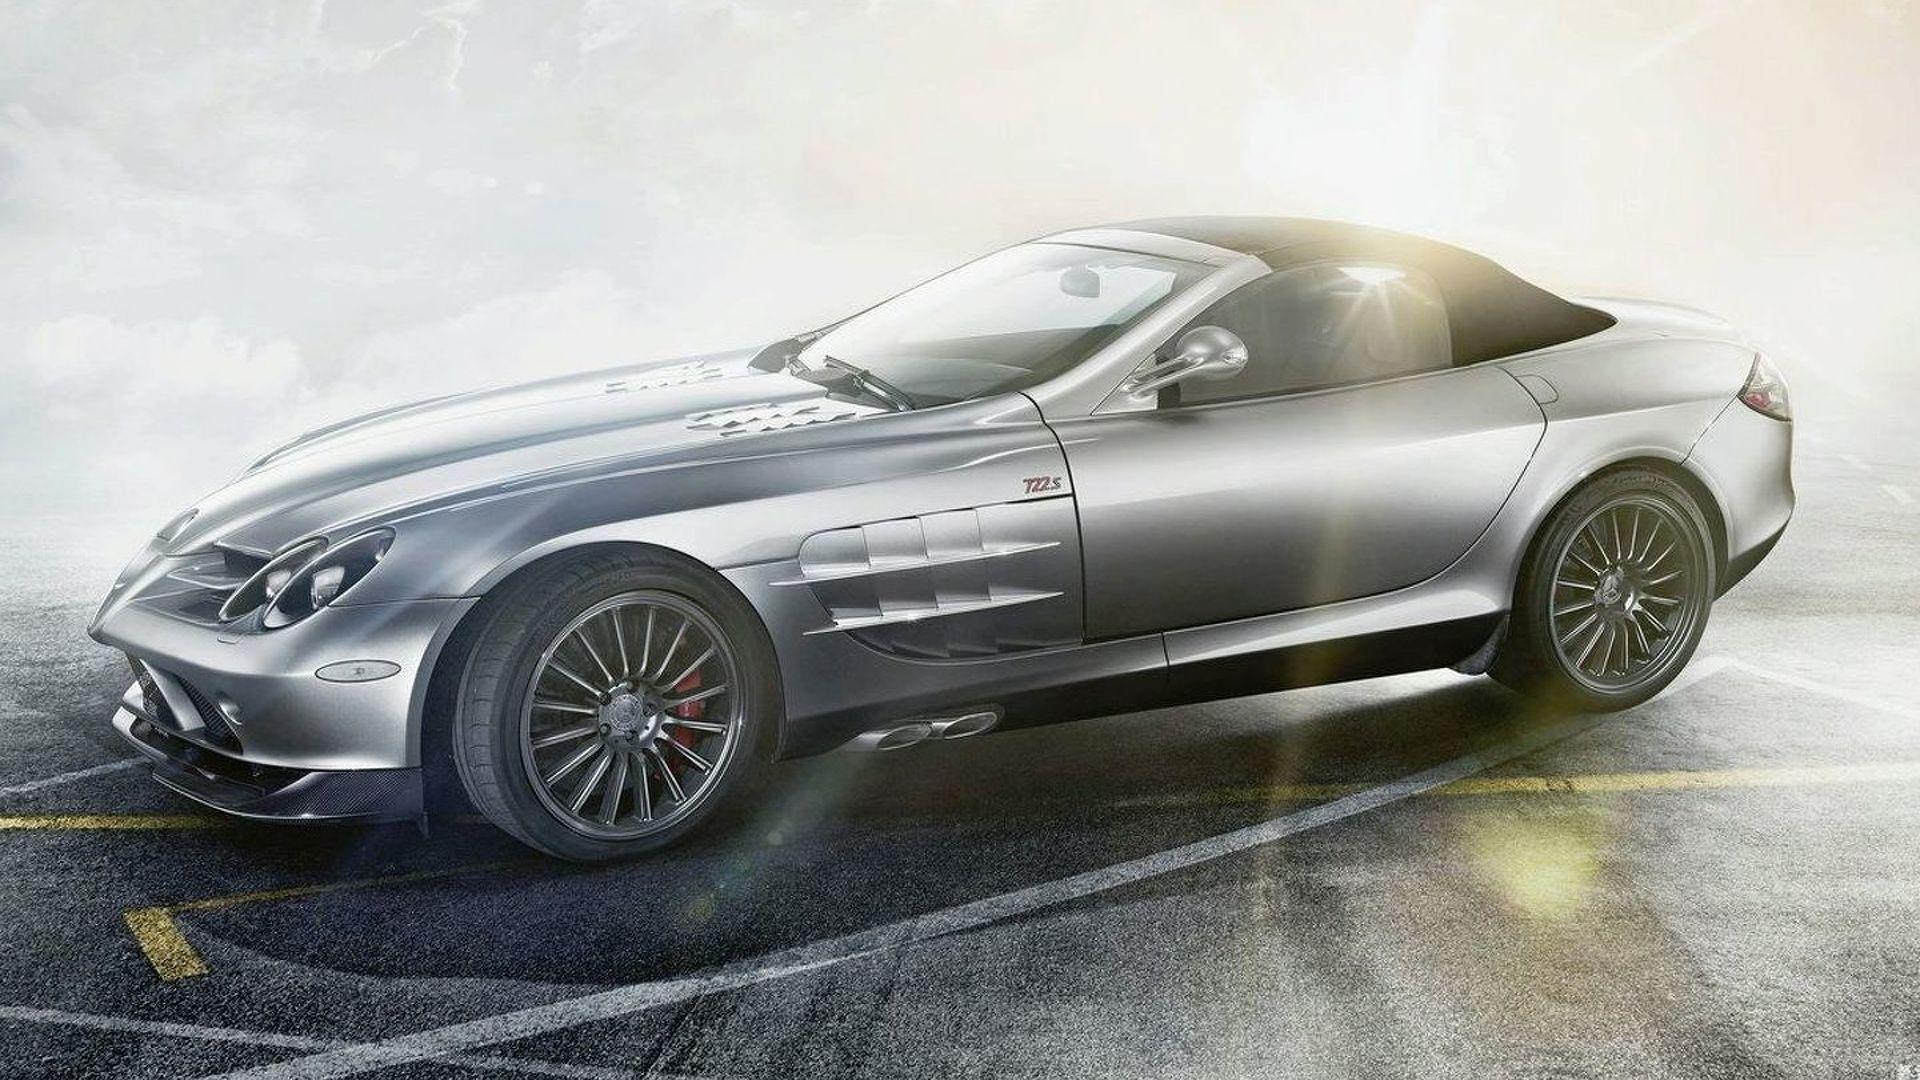 Mercedes Benz Selling Rare Slr Mclaren 722 S Roadster For 1 45m